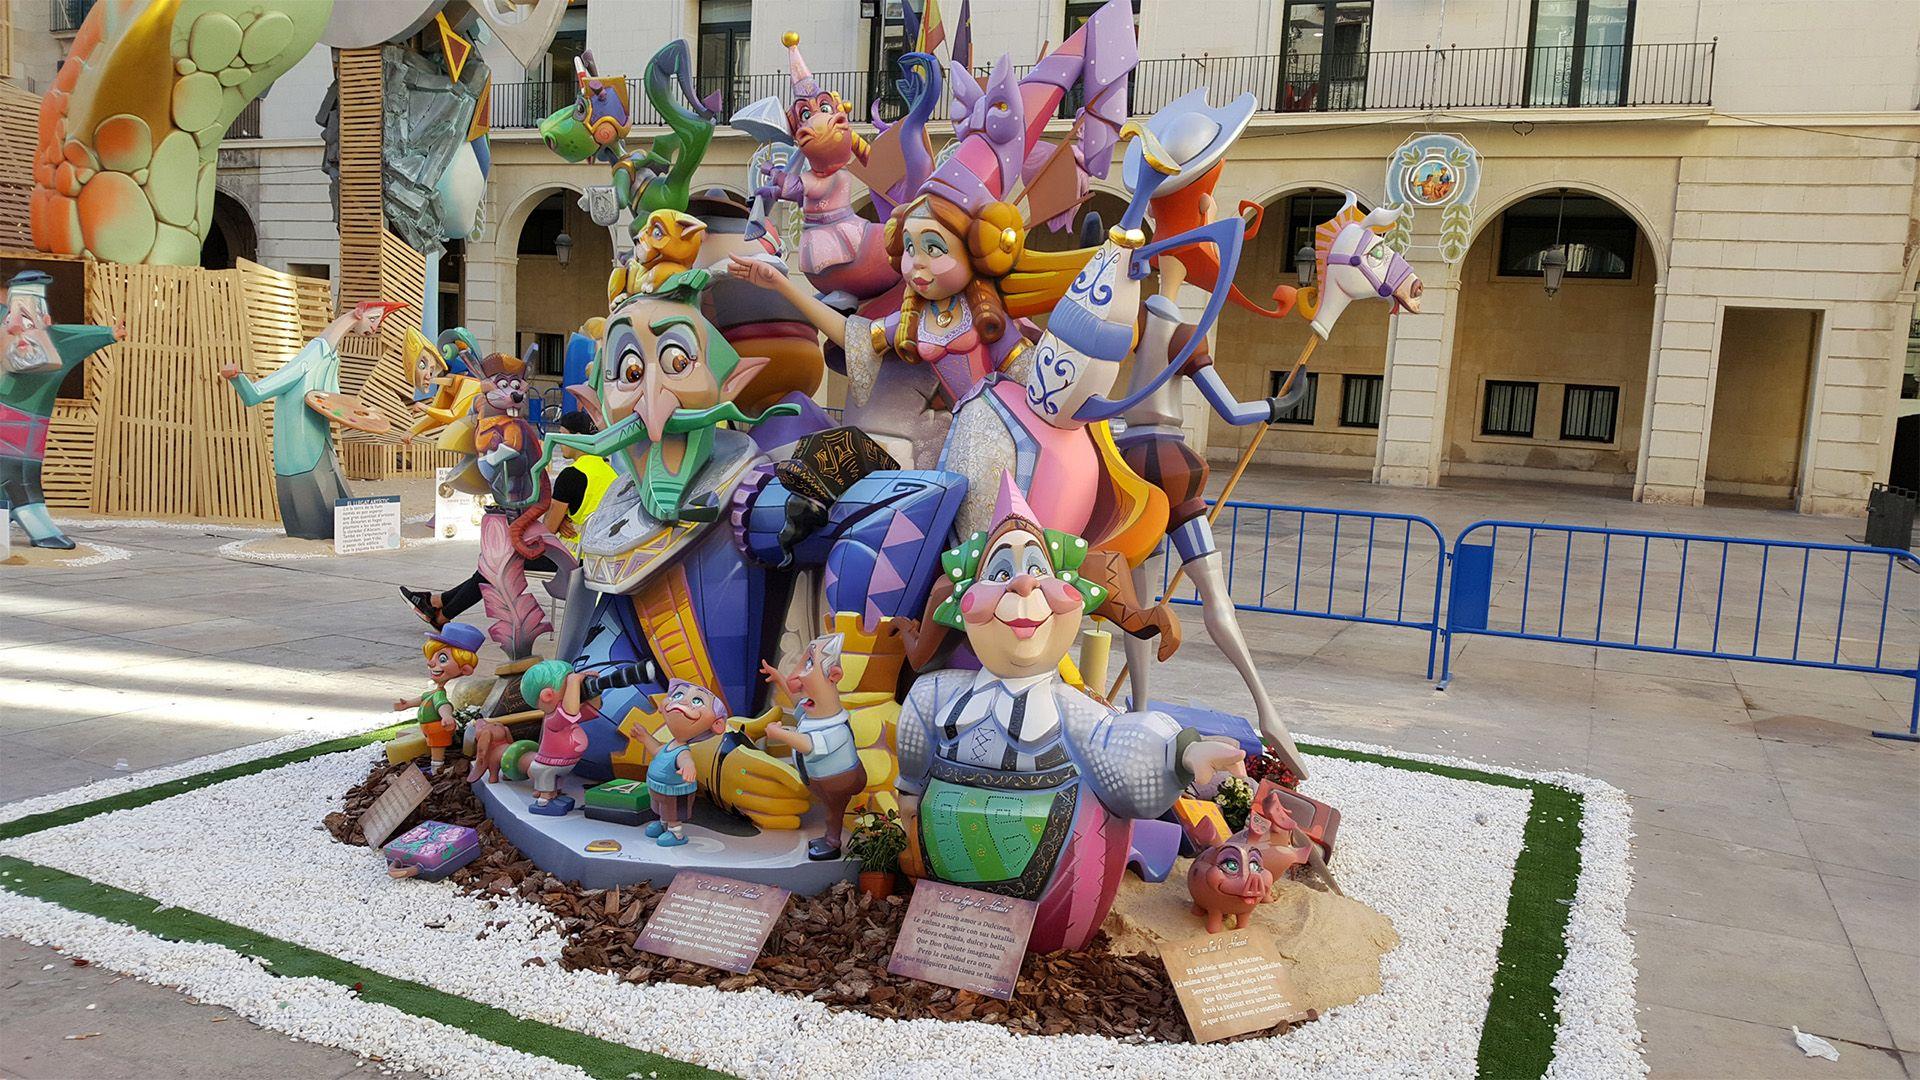 Alicante festivals, fairs and carnivals